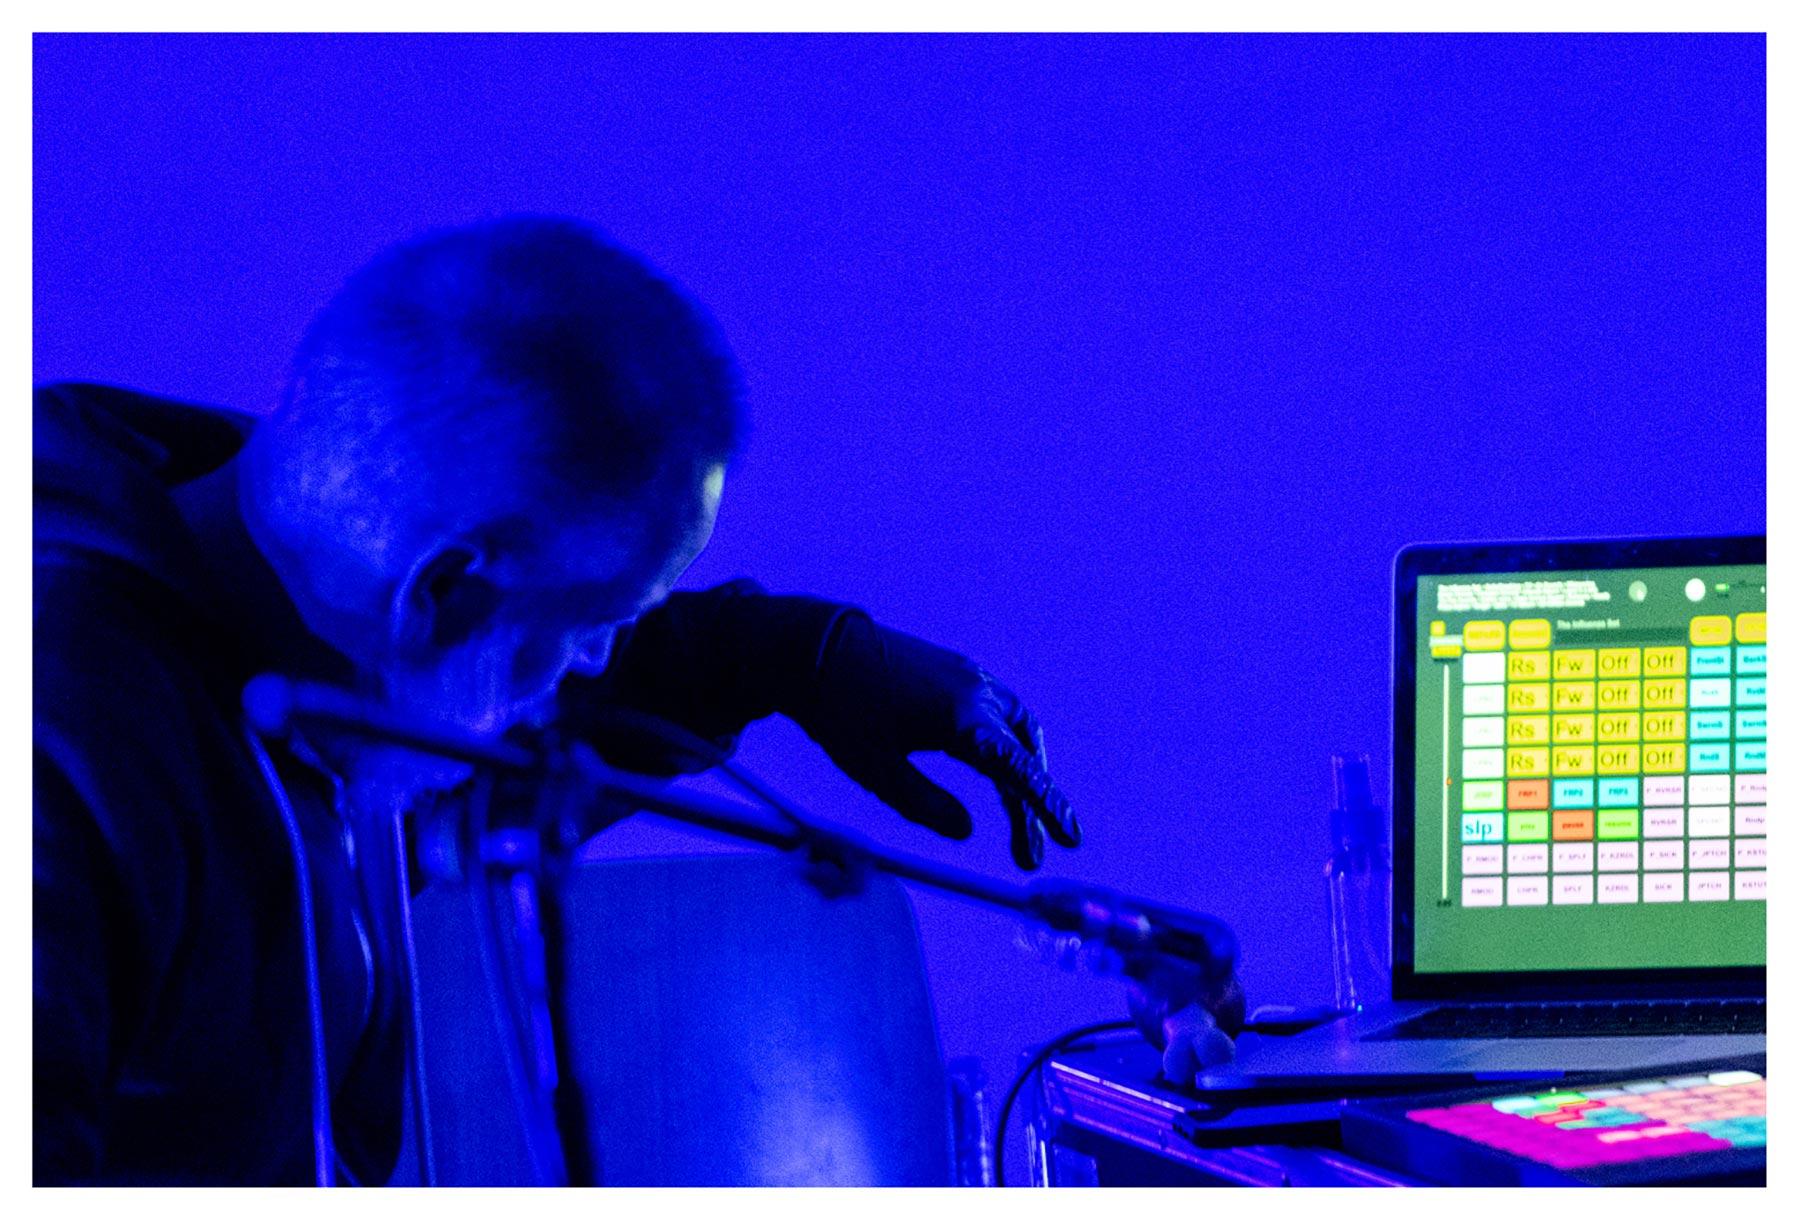 Jeff Kaiser at the Bernaola Music Festival, Artium, Vitoria-Gasteiz, Spain